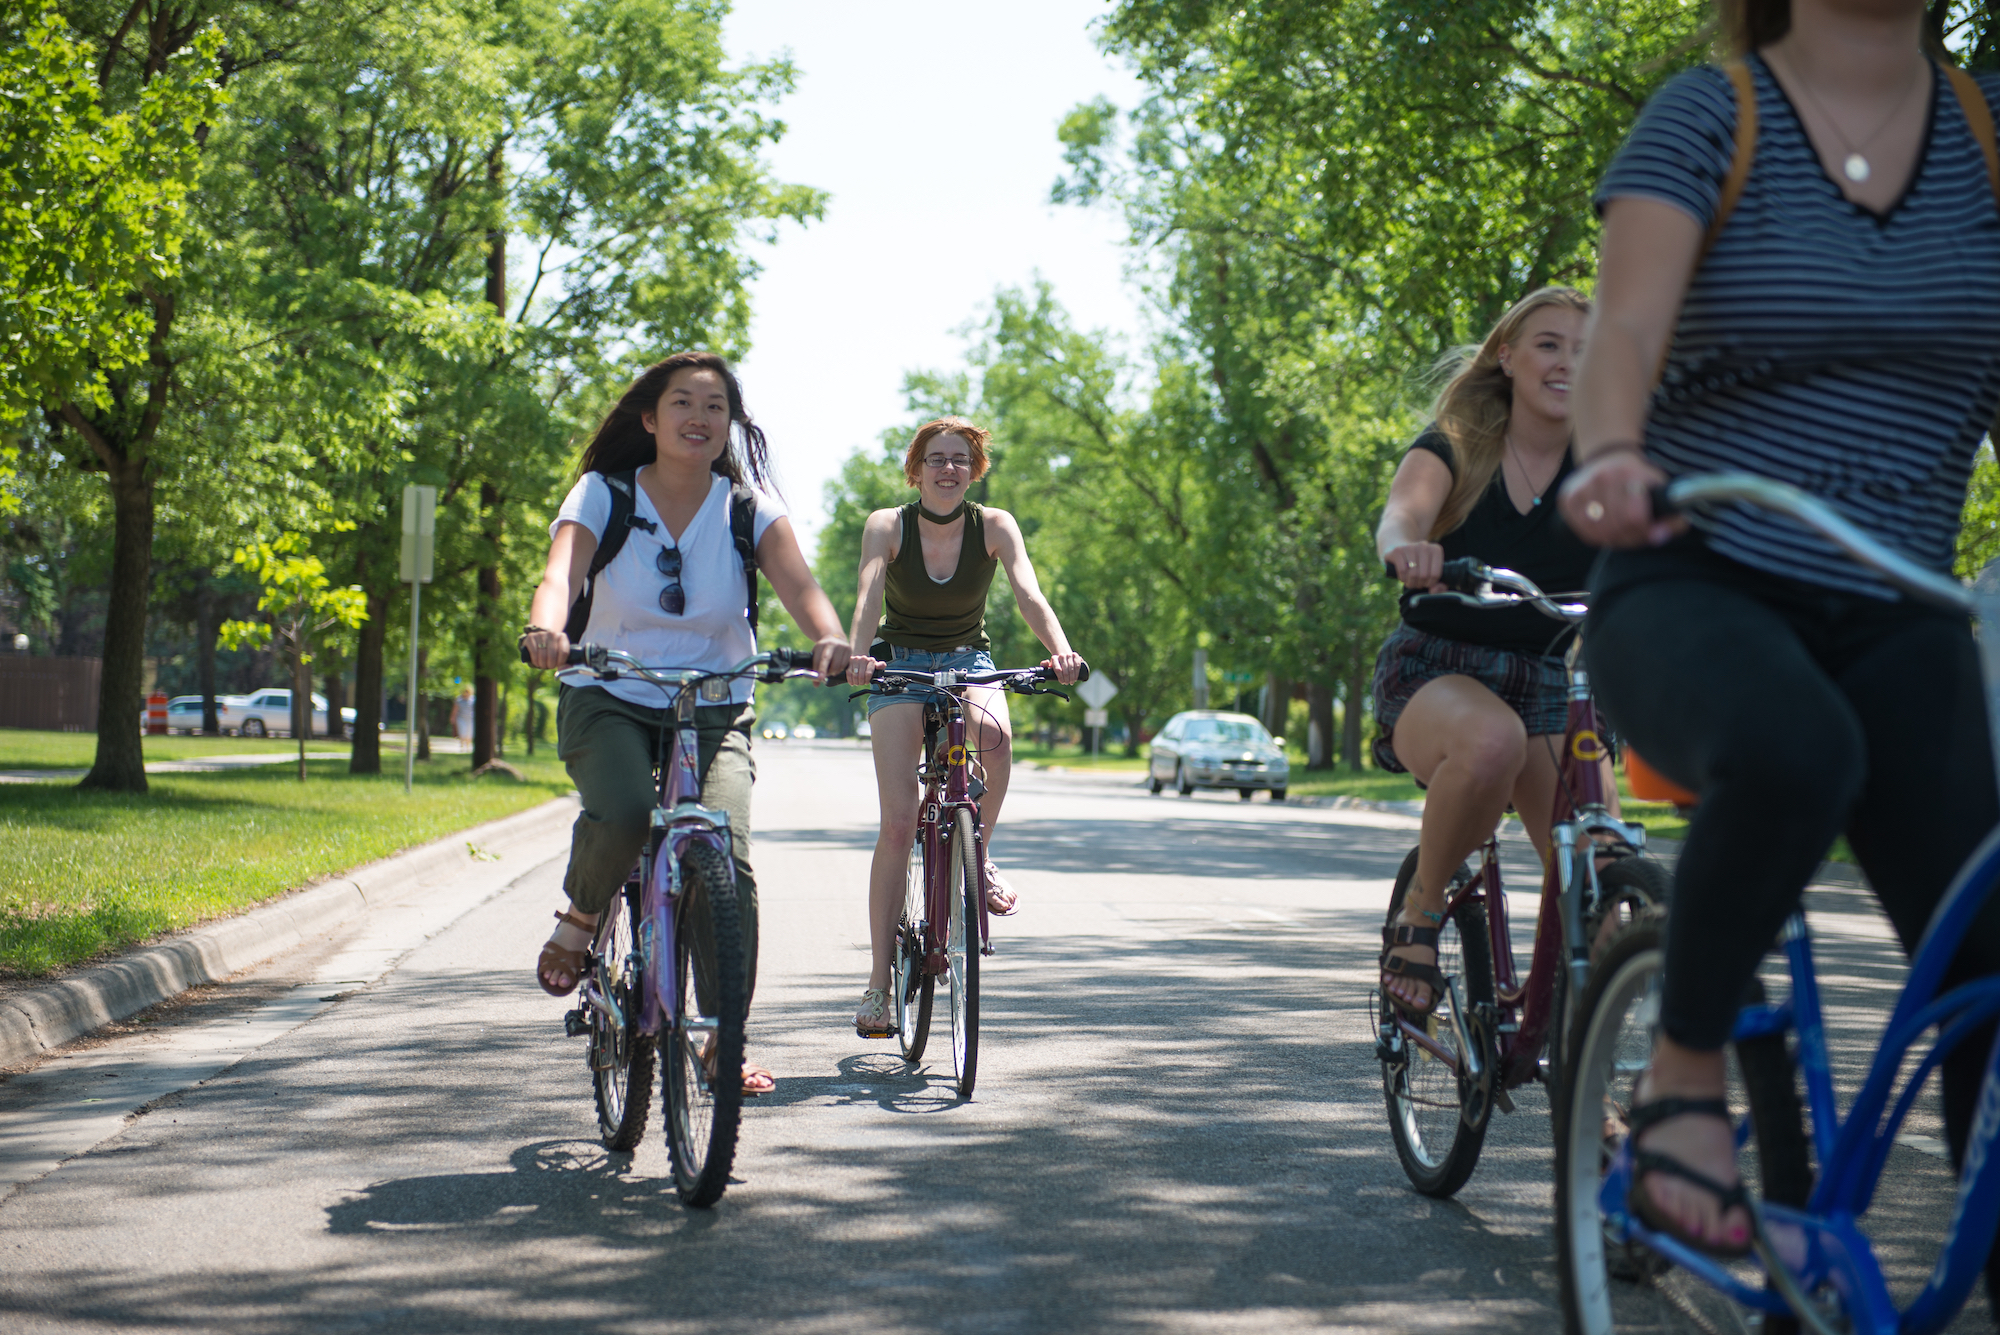 Friends Bike Together